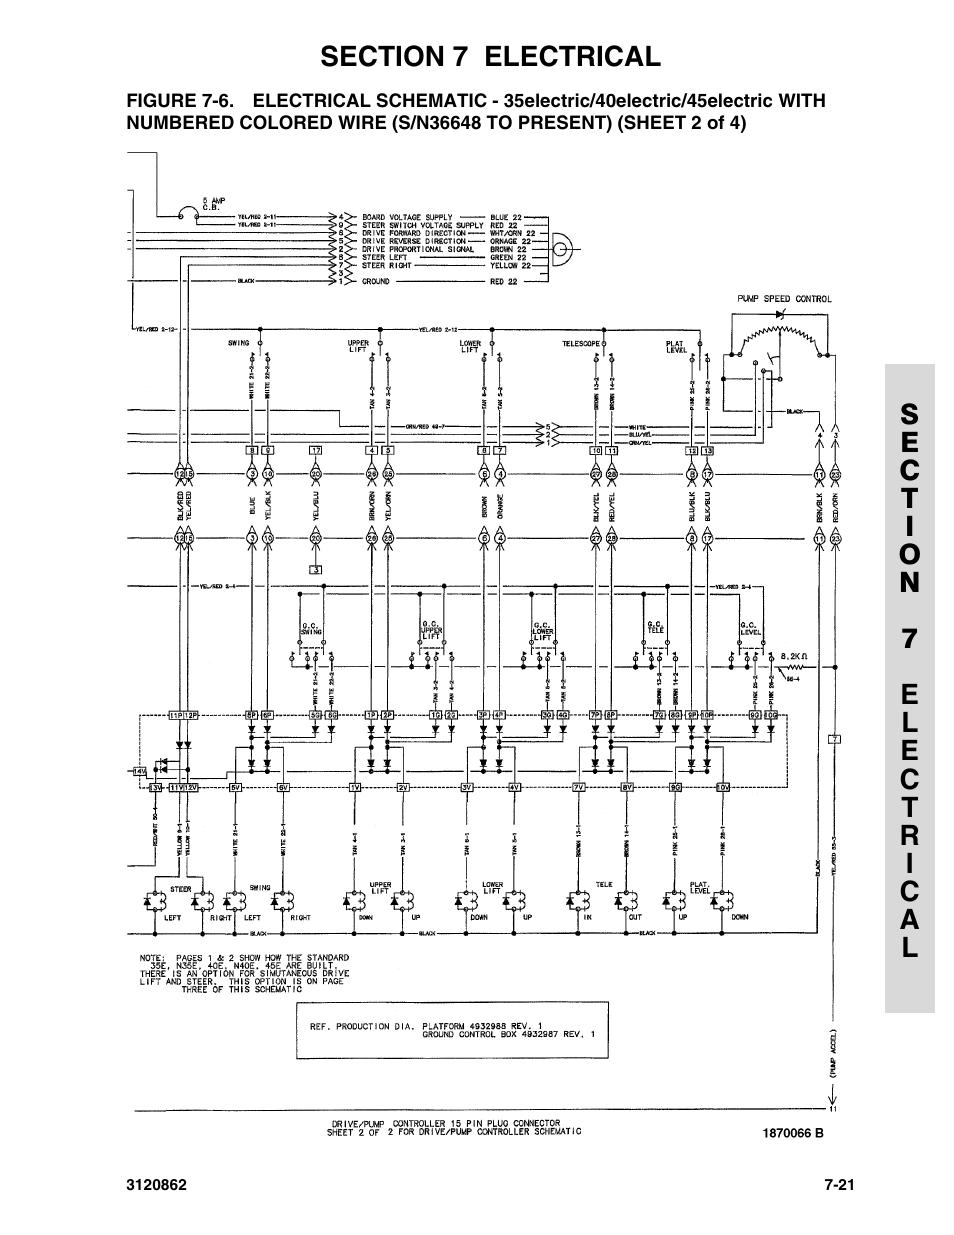 jlg n40e wiring diagram automotive wiring diagram u2022 rh nfluencer co JLG E450AJ JLG E450AJ